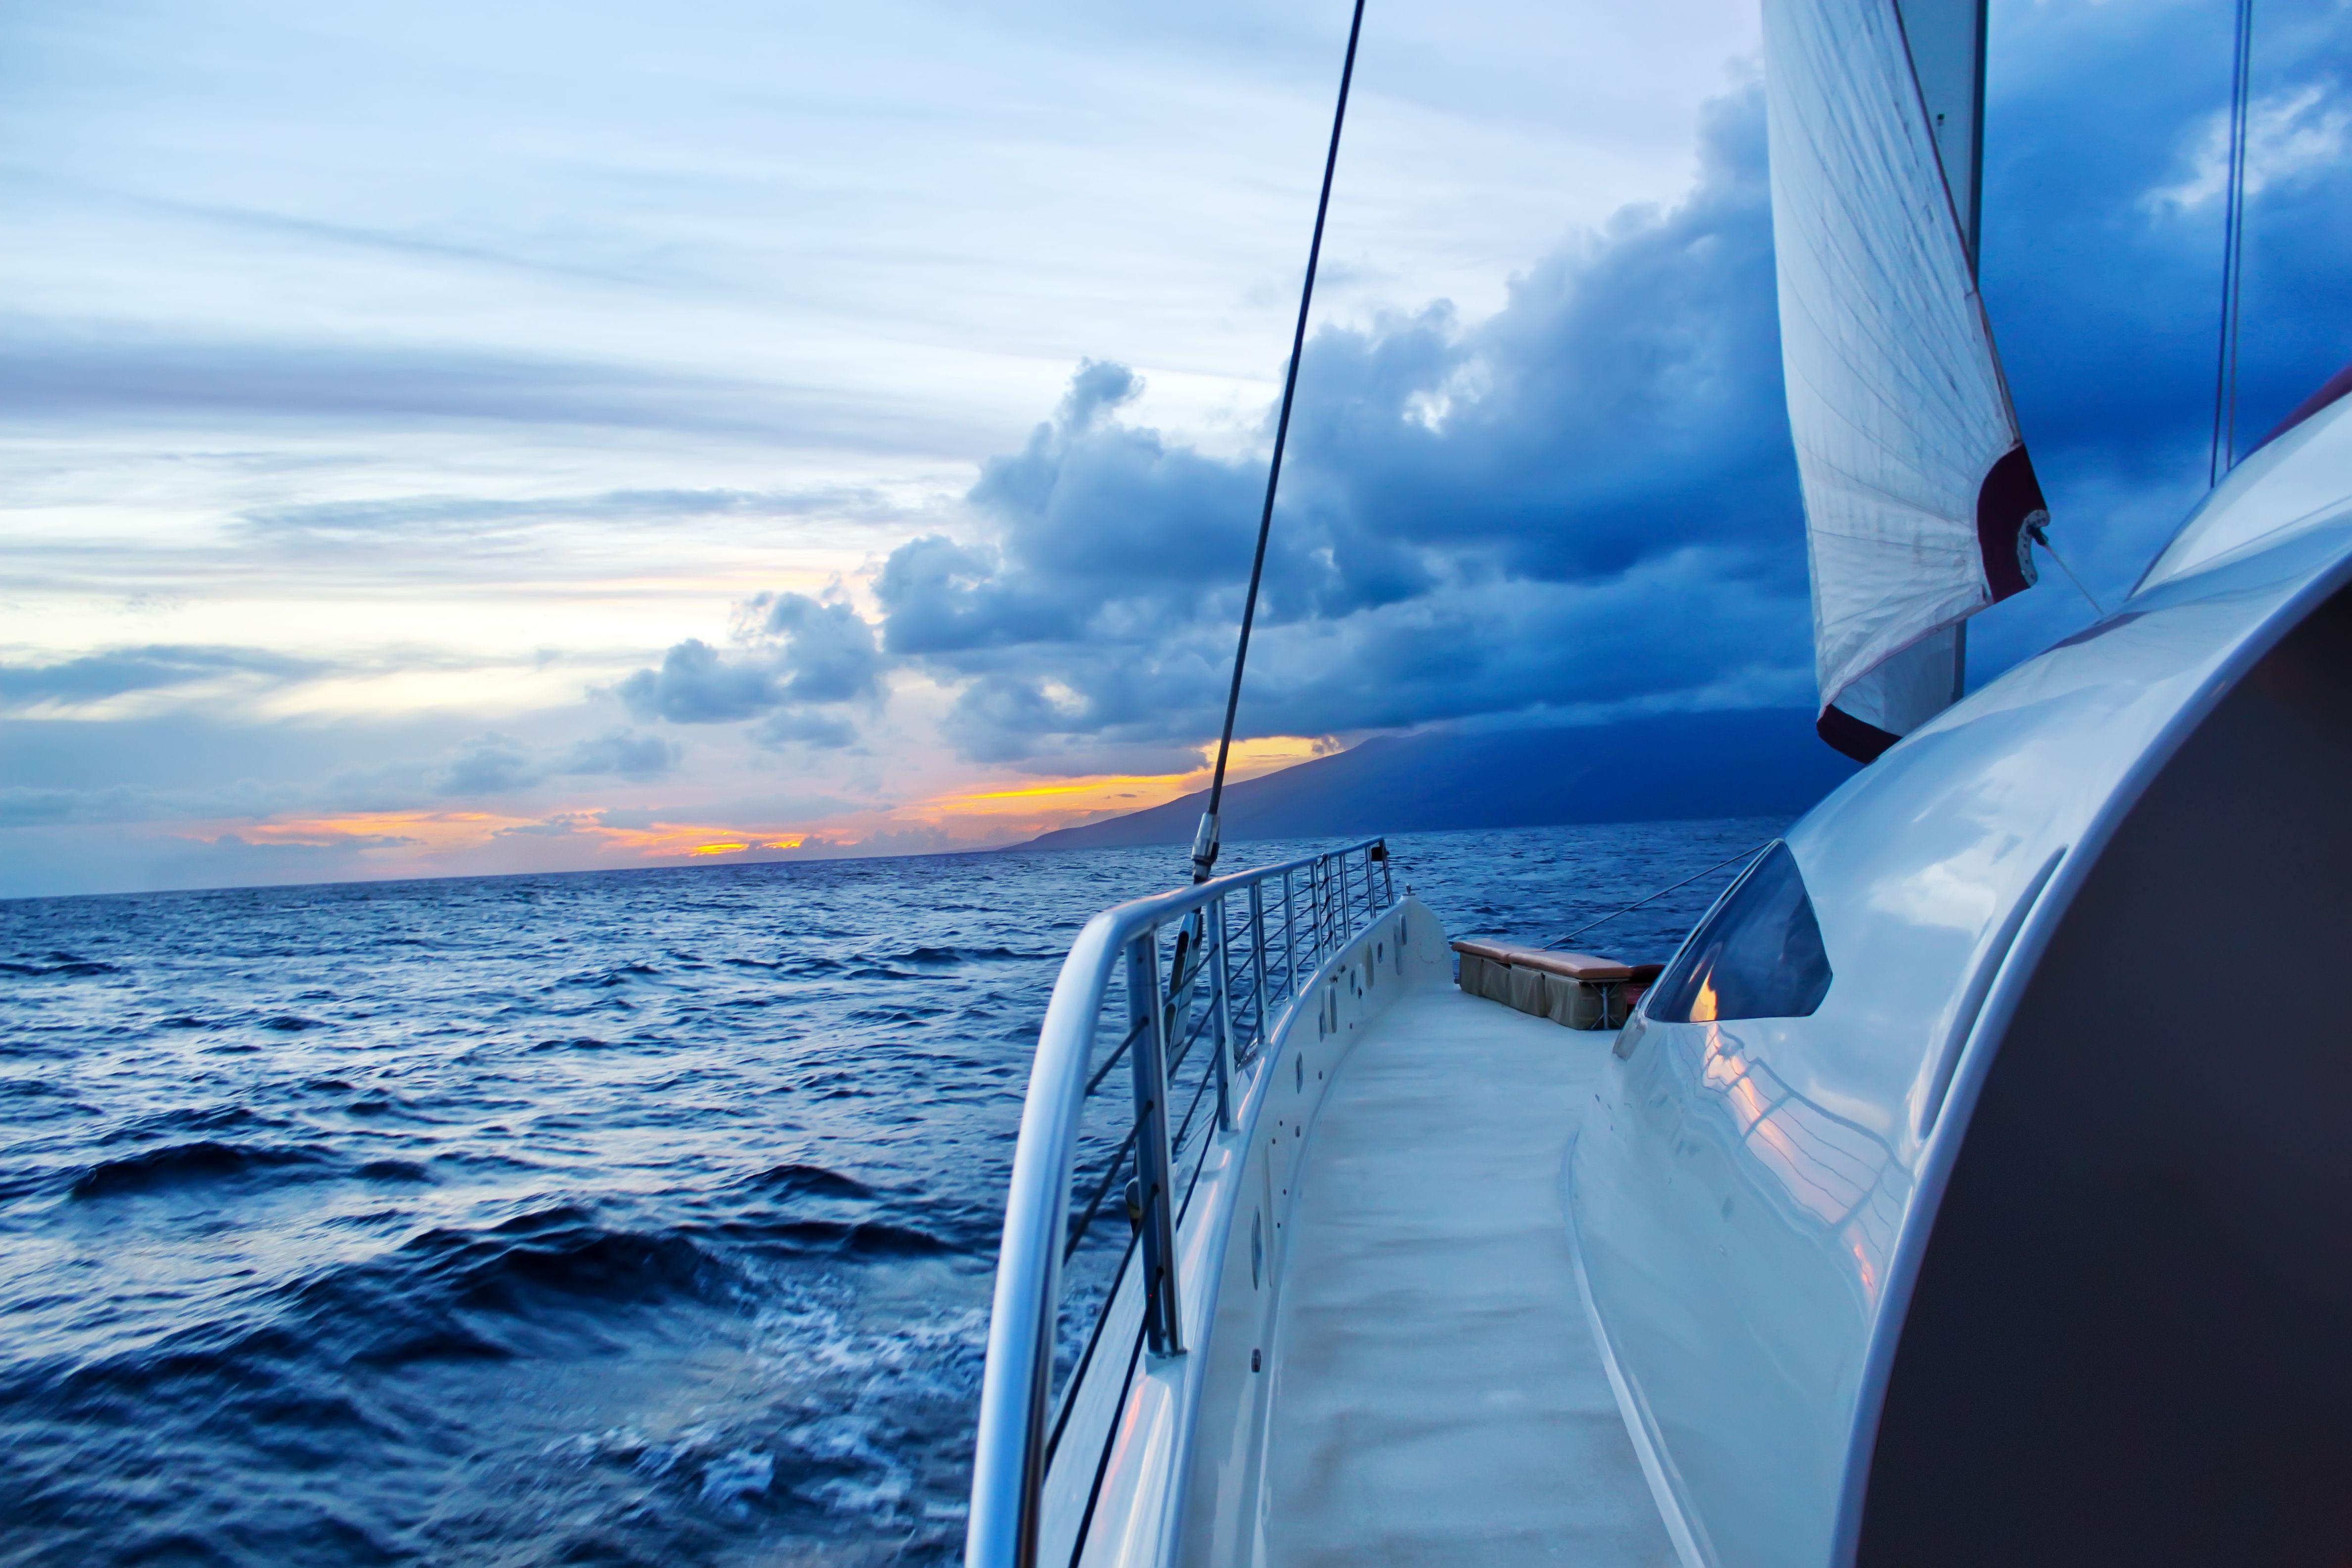 Aboard the 65 foot catamaran Yacht, the Hula Girl off the